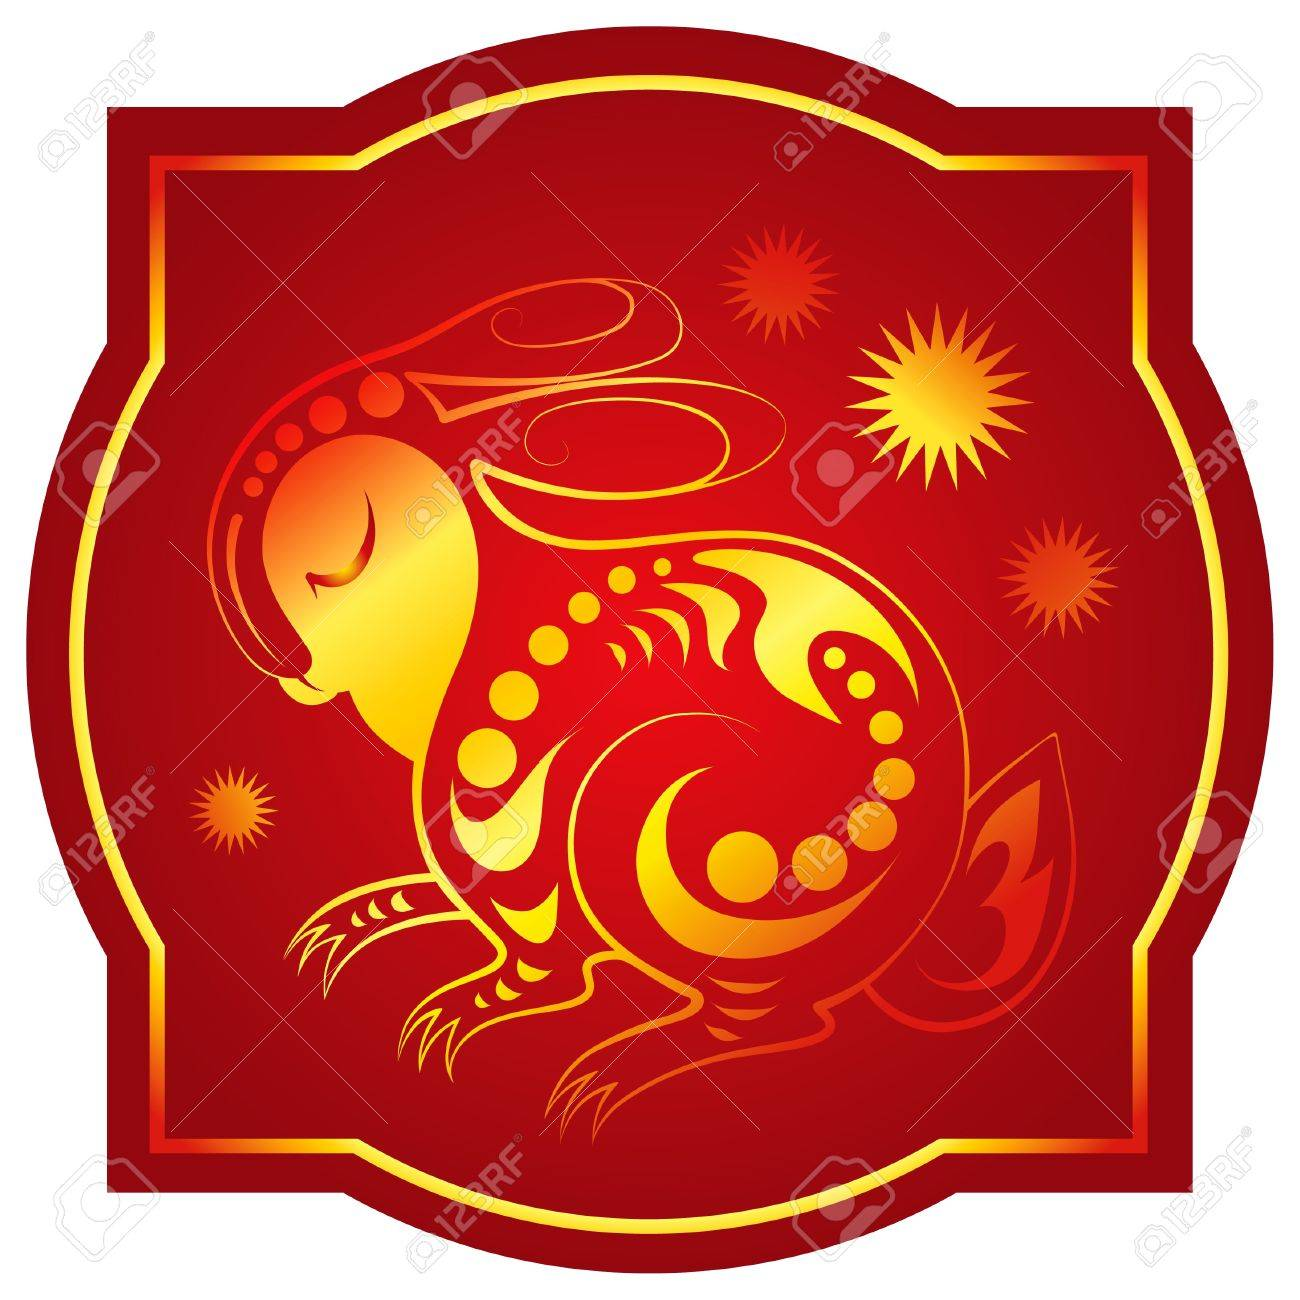 Golden-red chinese horoscope. Rabbit Stock Vector - 10406466